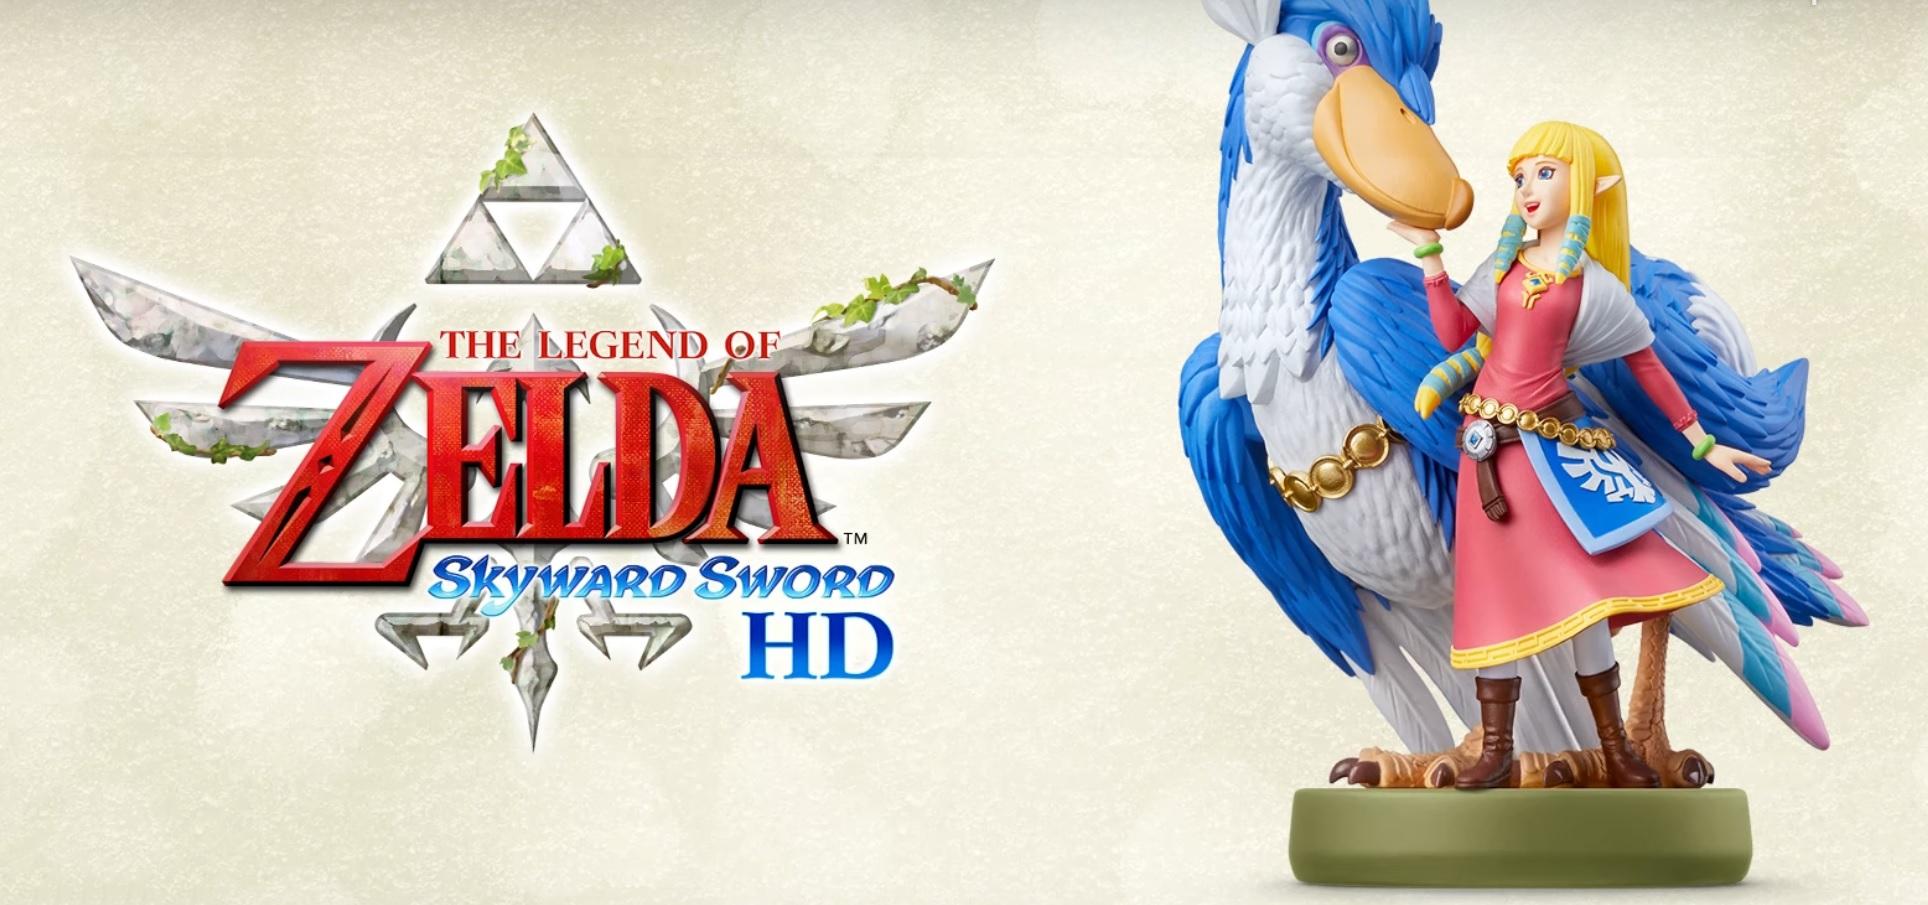 Nuovo trailer e amiibo per The Legend of Zelda: Skyward Sword